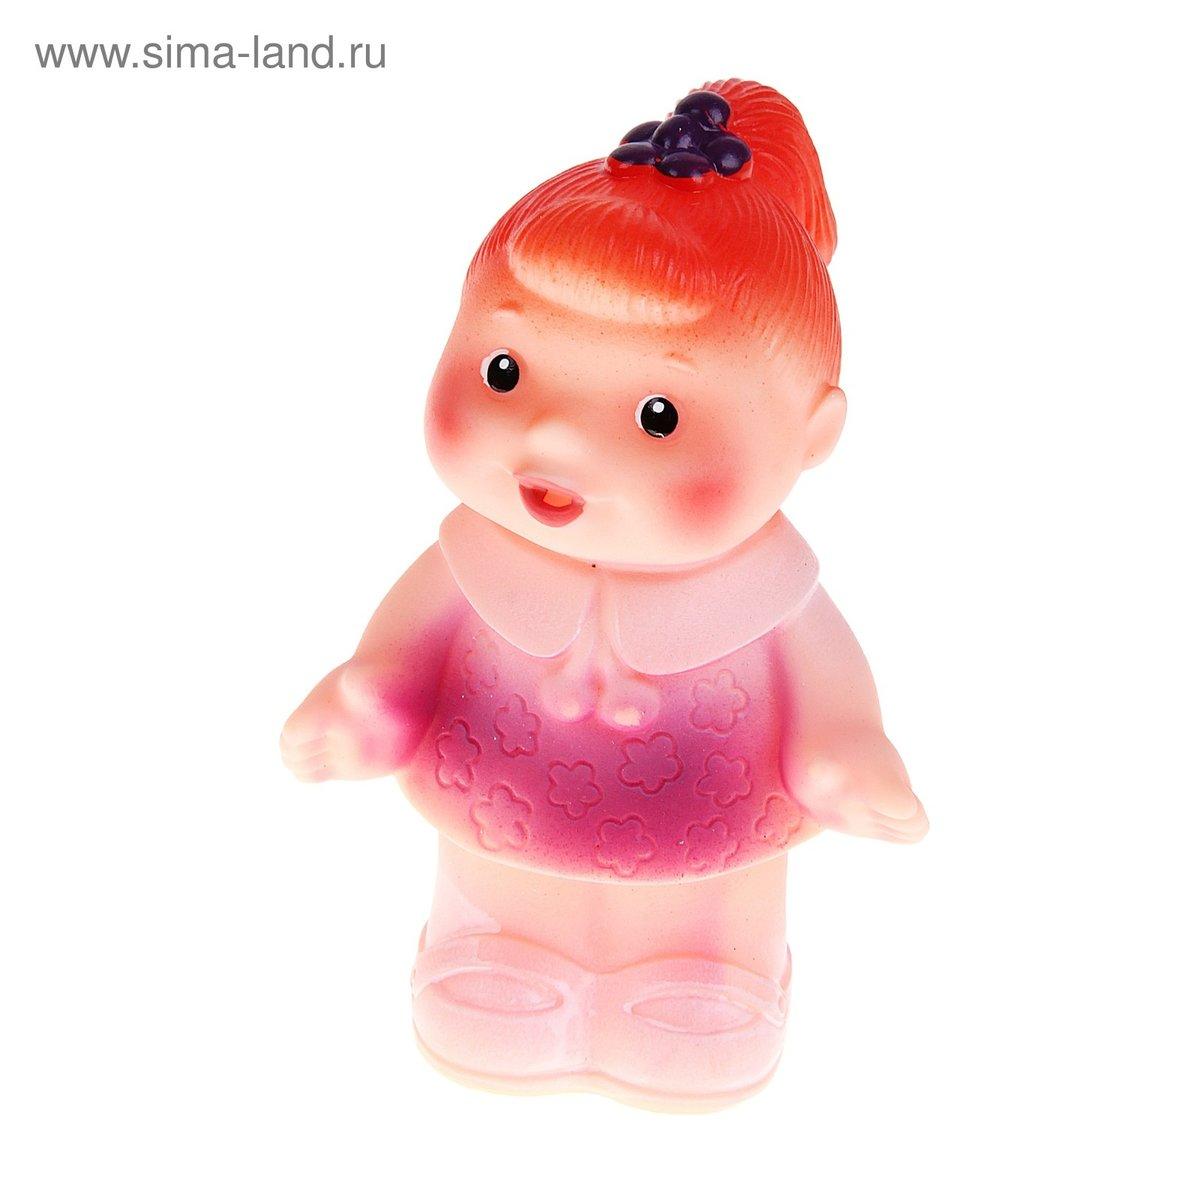 Девушки и резиновые игрушки